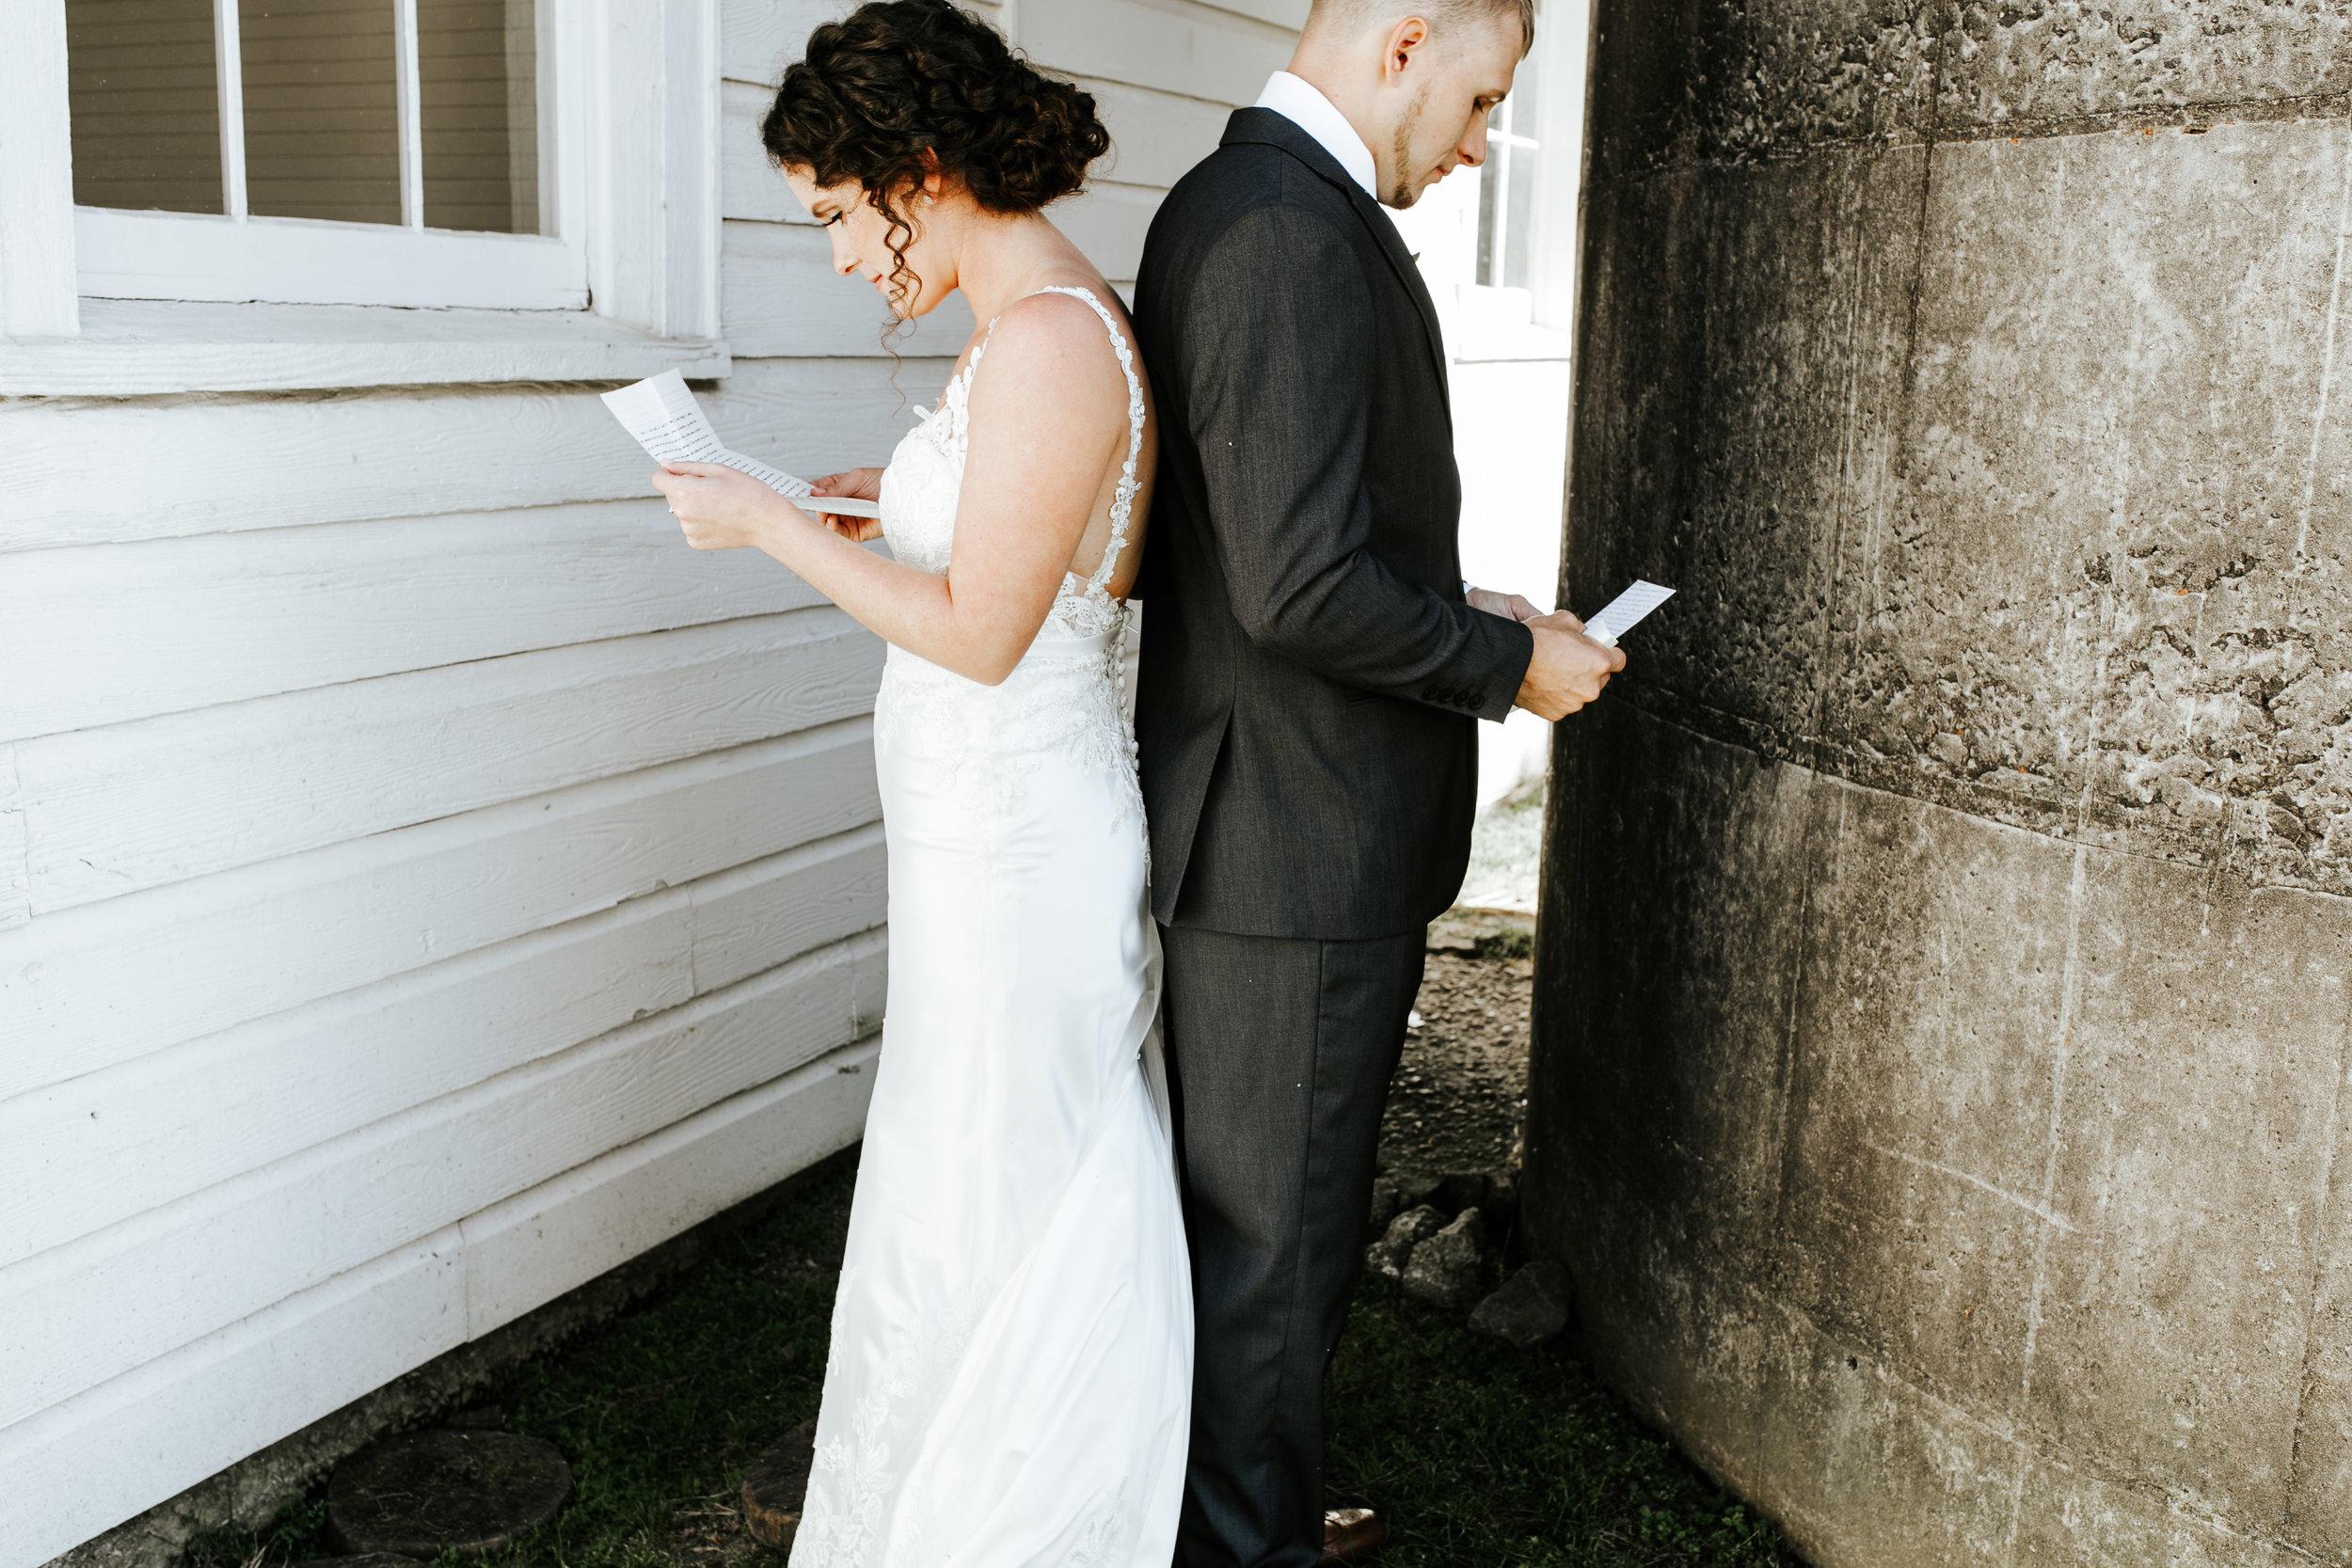 rebeccabuddywedding-27.jpg